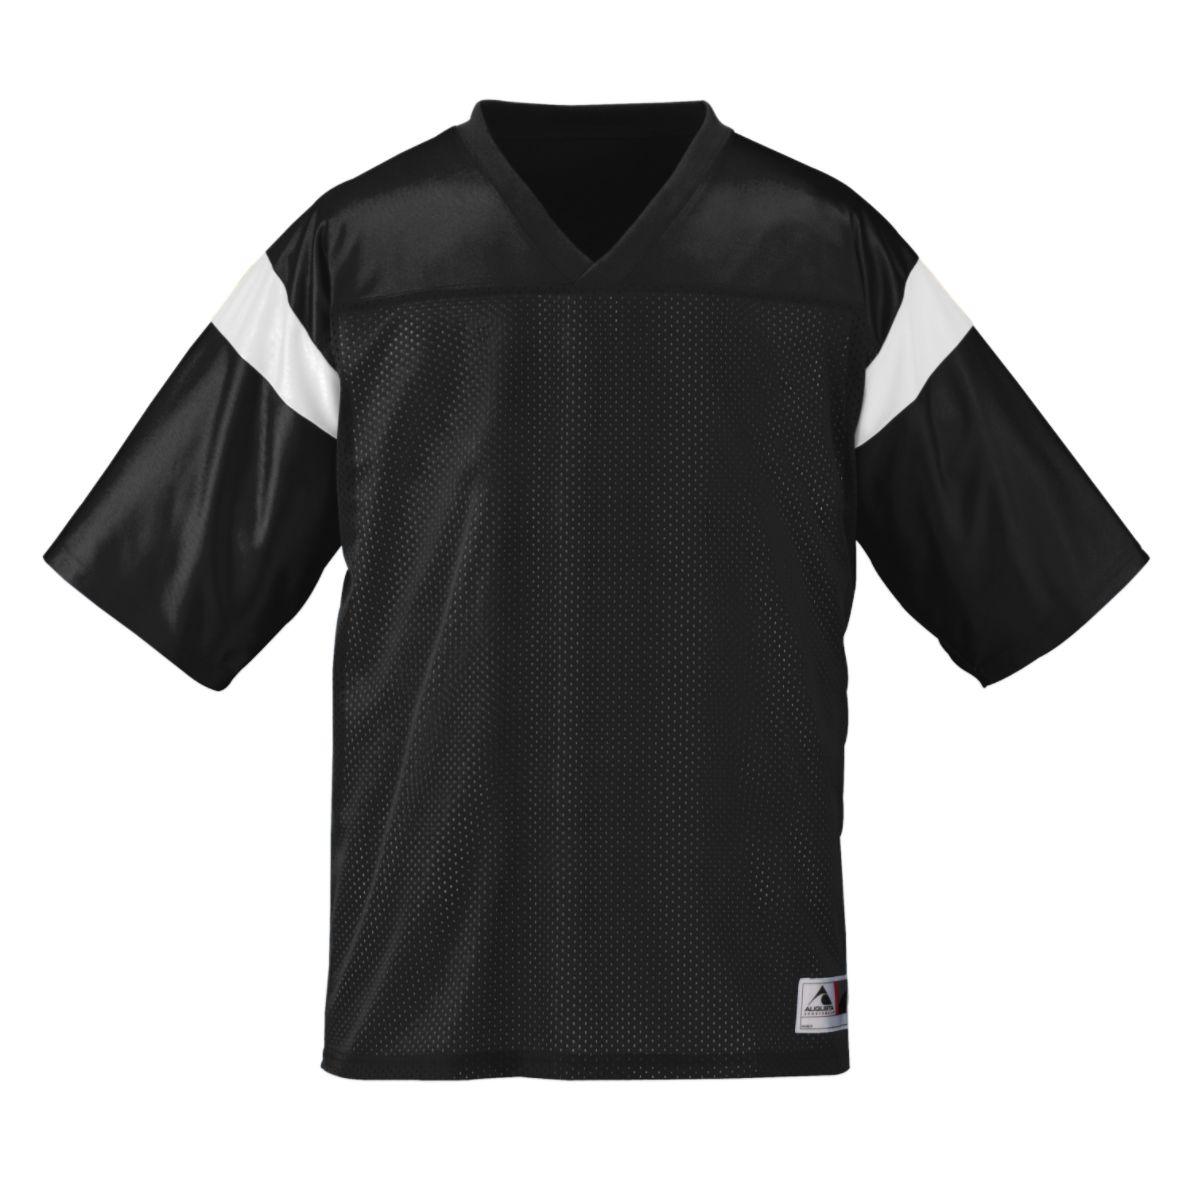 Augusta Sportswear Men's Pep Rally Replica Tee 2Xl Black/White - image 1 of 1